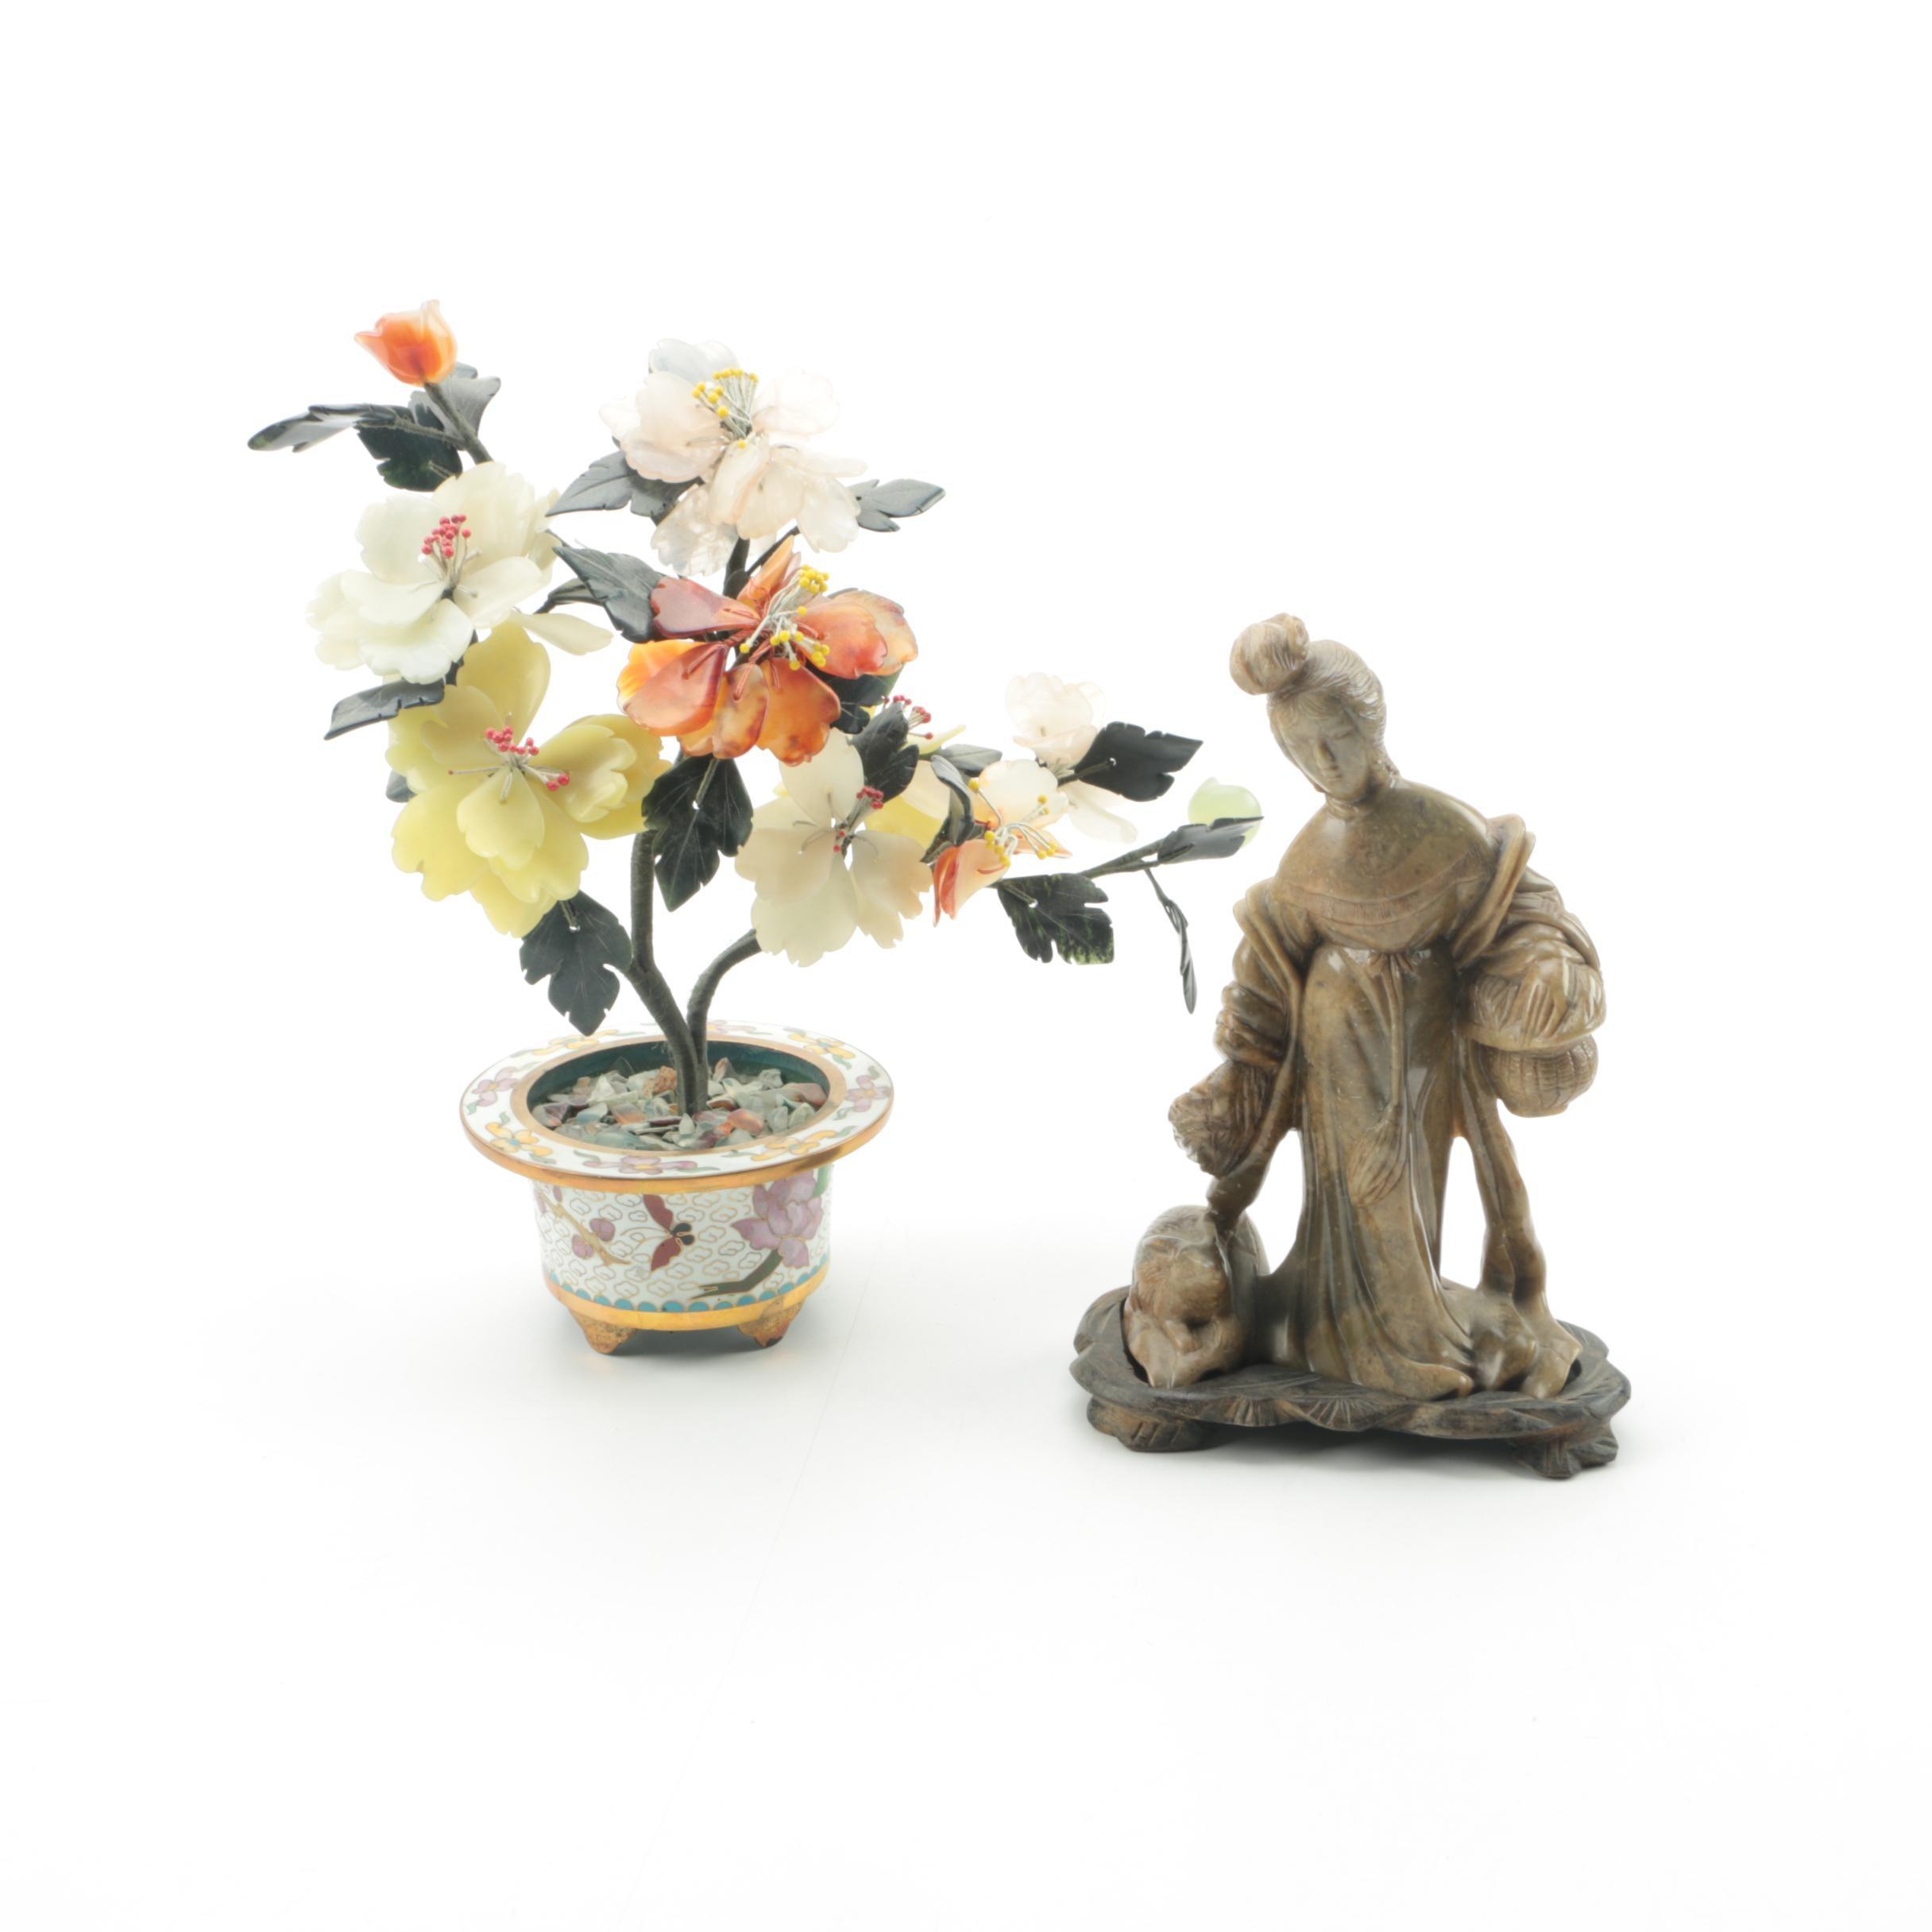 Soapstone Figurine and Quartz Tree